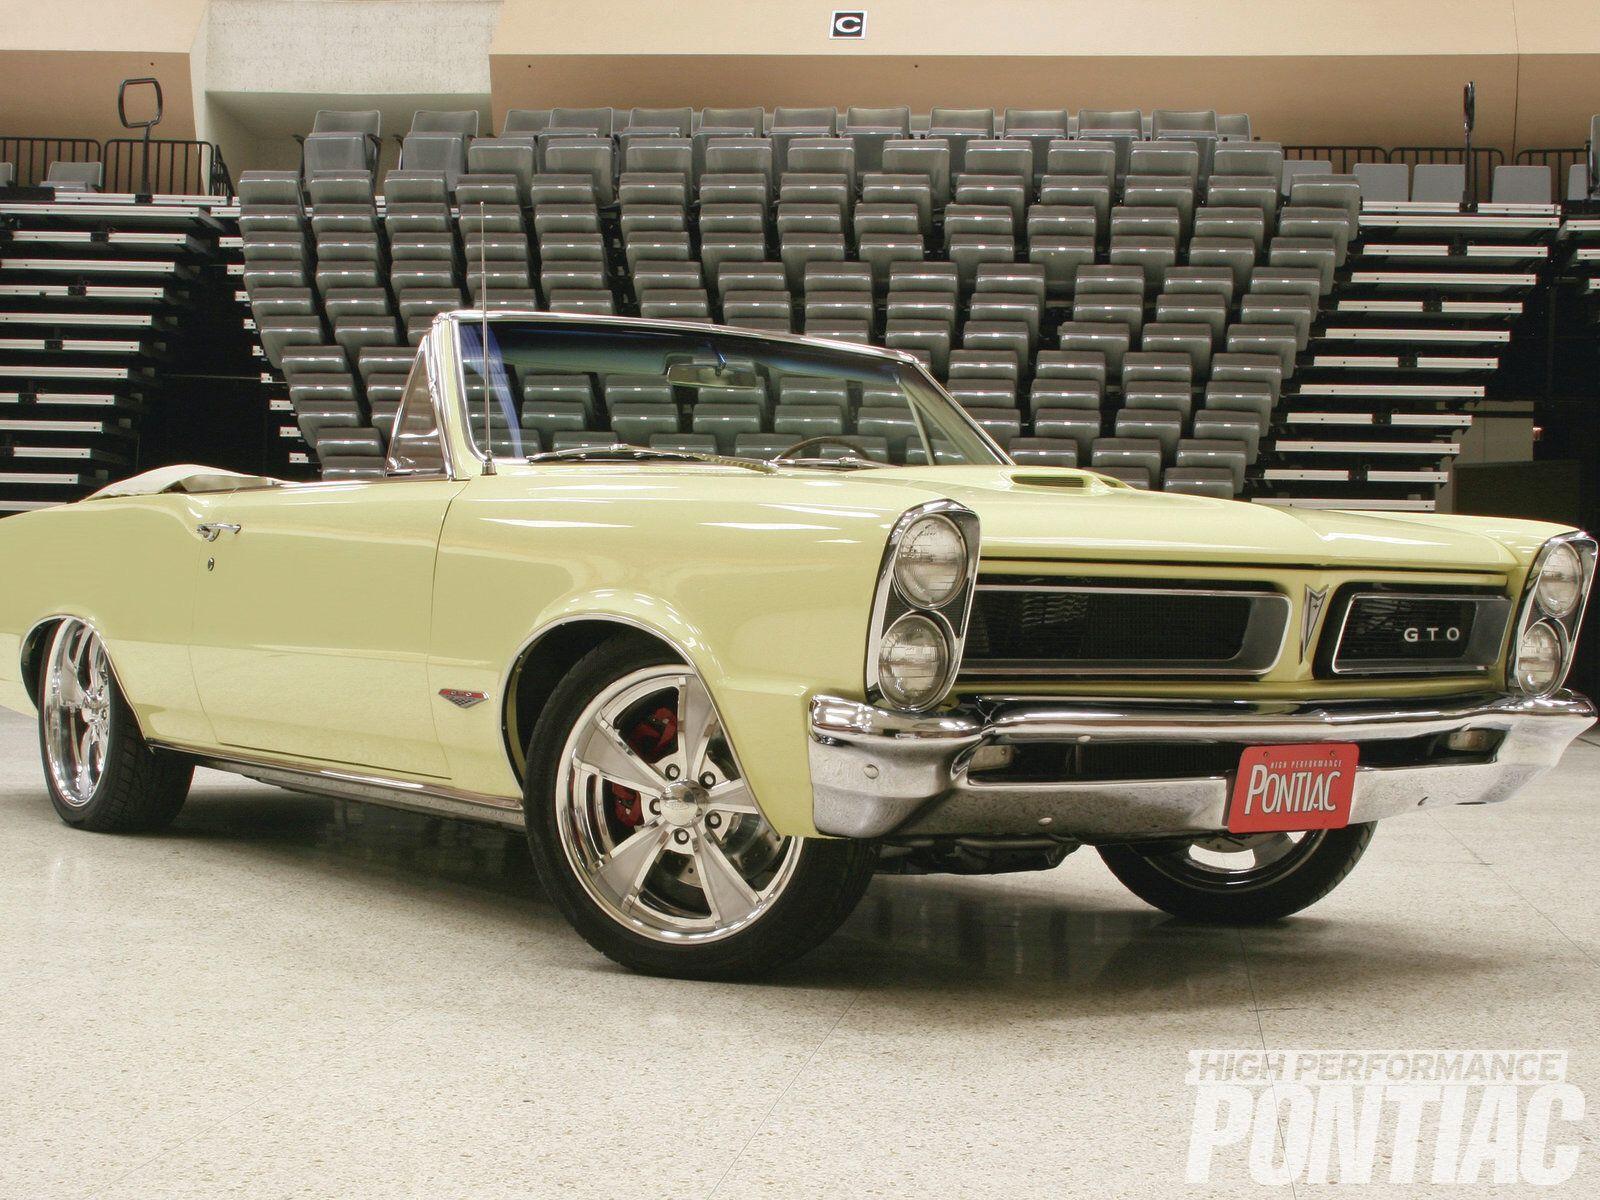 1965 Pontiac Gto My College Muscle Car Pontiac Gto 1965 Pontiac Gto Gto